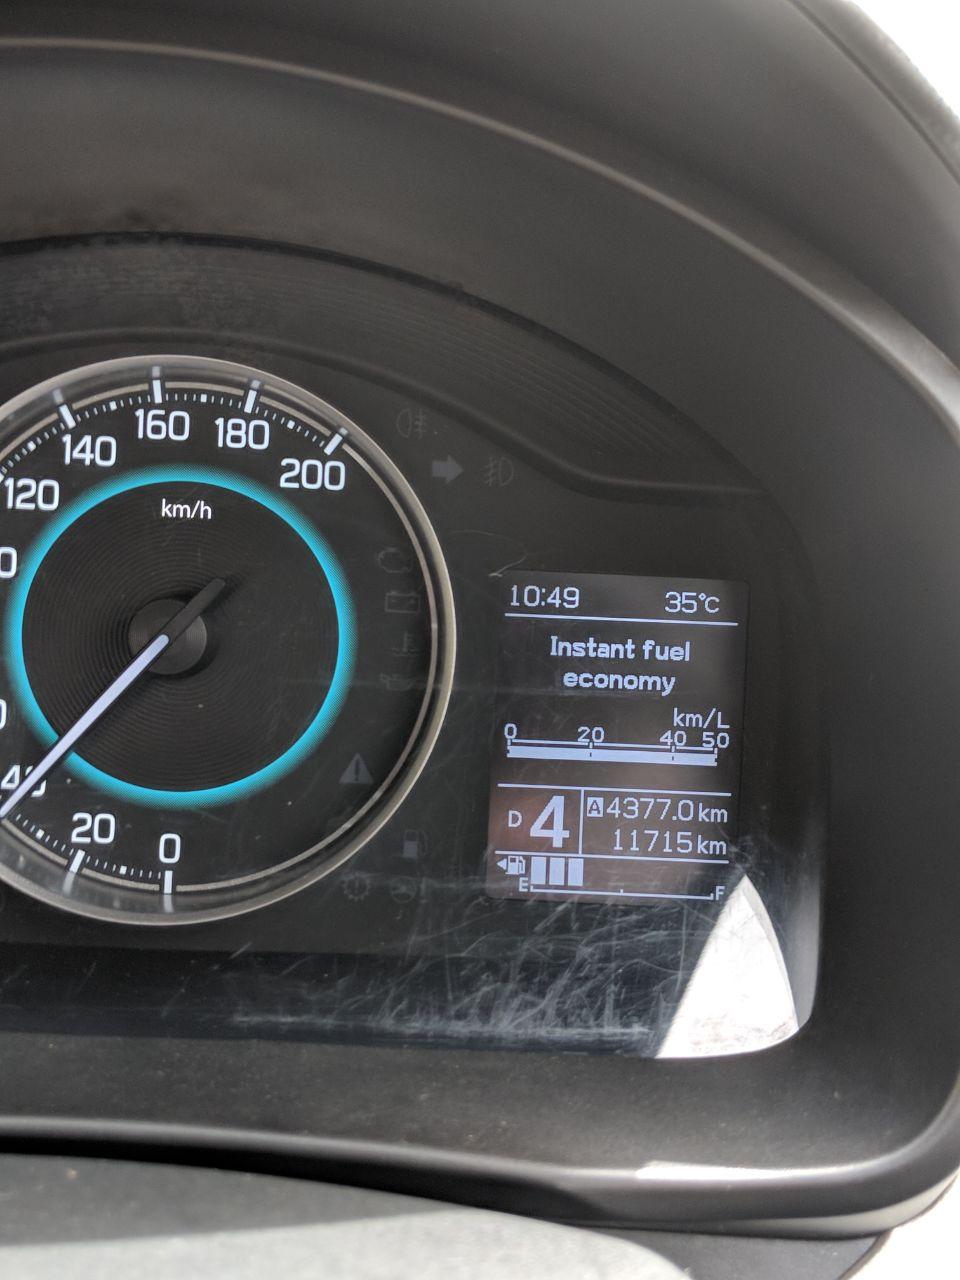 Maruti Suzuki Ignis Petrol AMT review: Fun car but does it